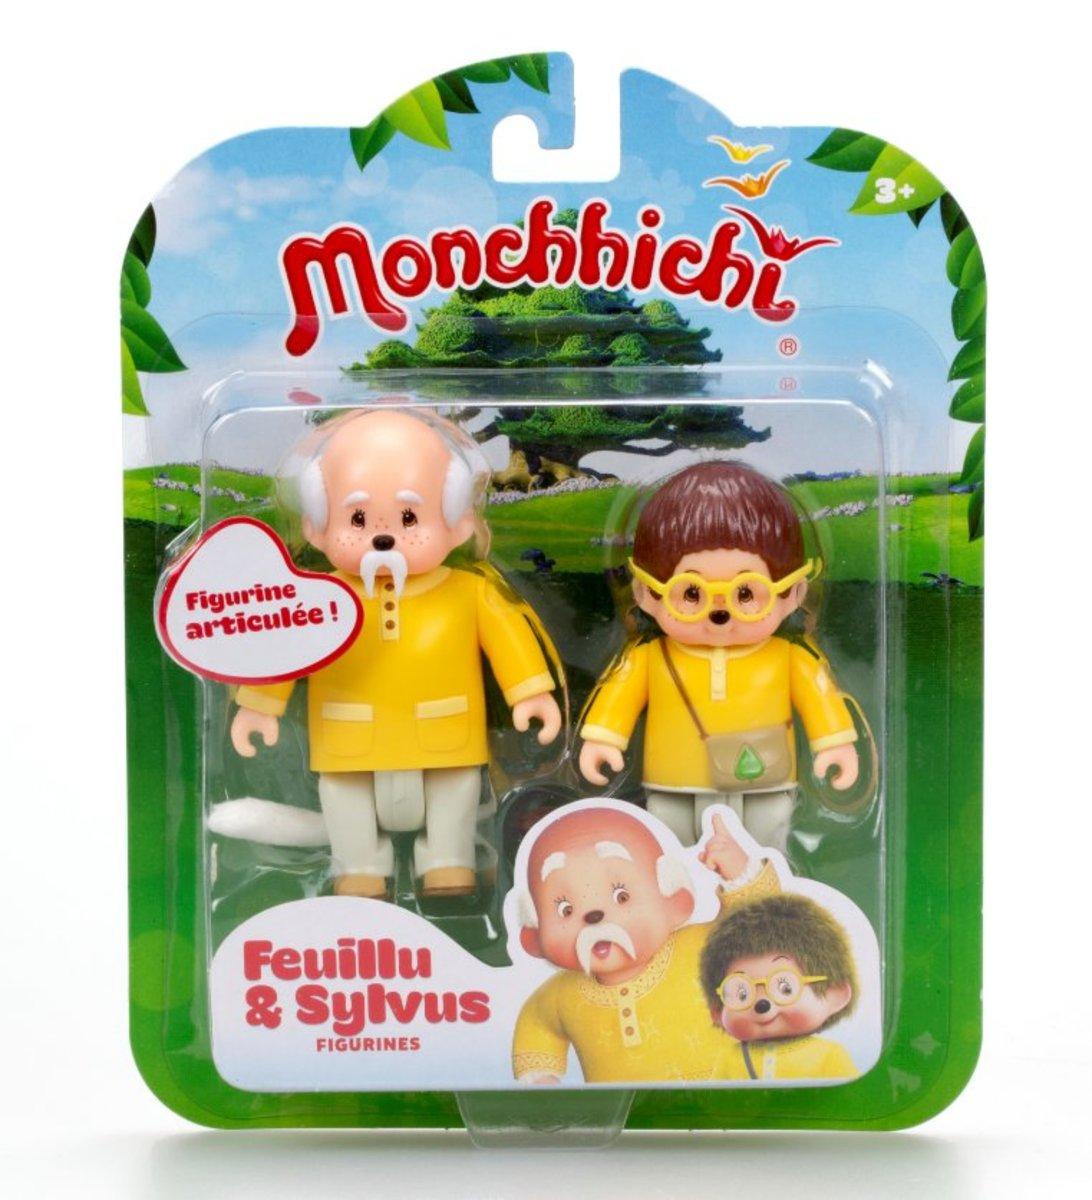 Monchhichi-Leafy & Sylvius Figurines